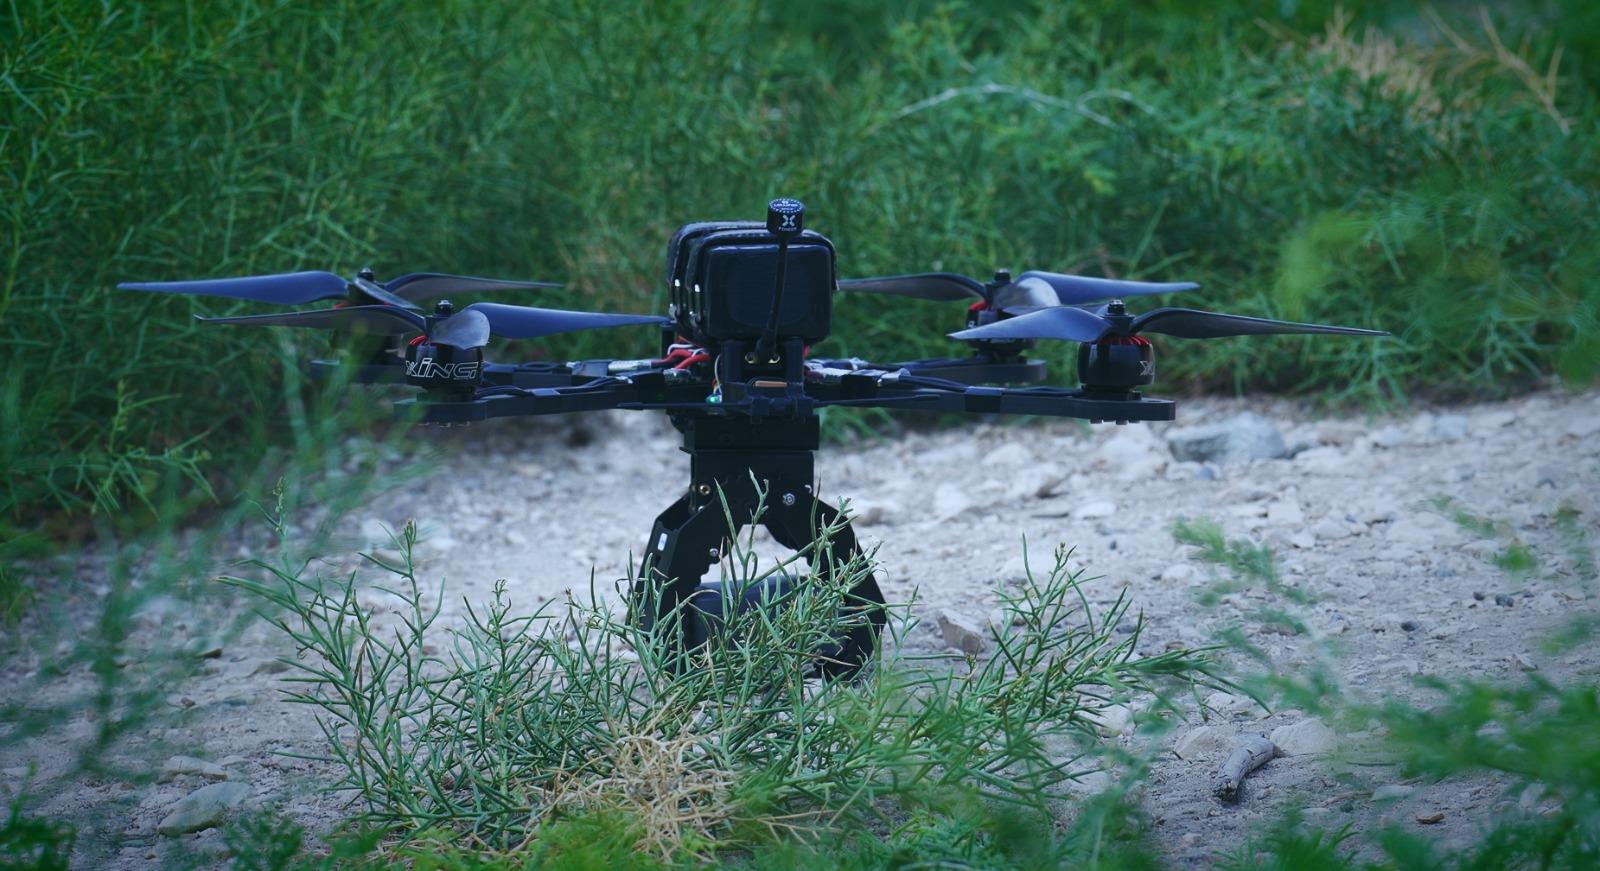 Advanced Israeli Drone Tech That's Taken Militaries By Storm Now Eyes Civilian Use 2